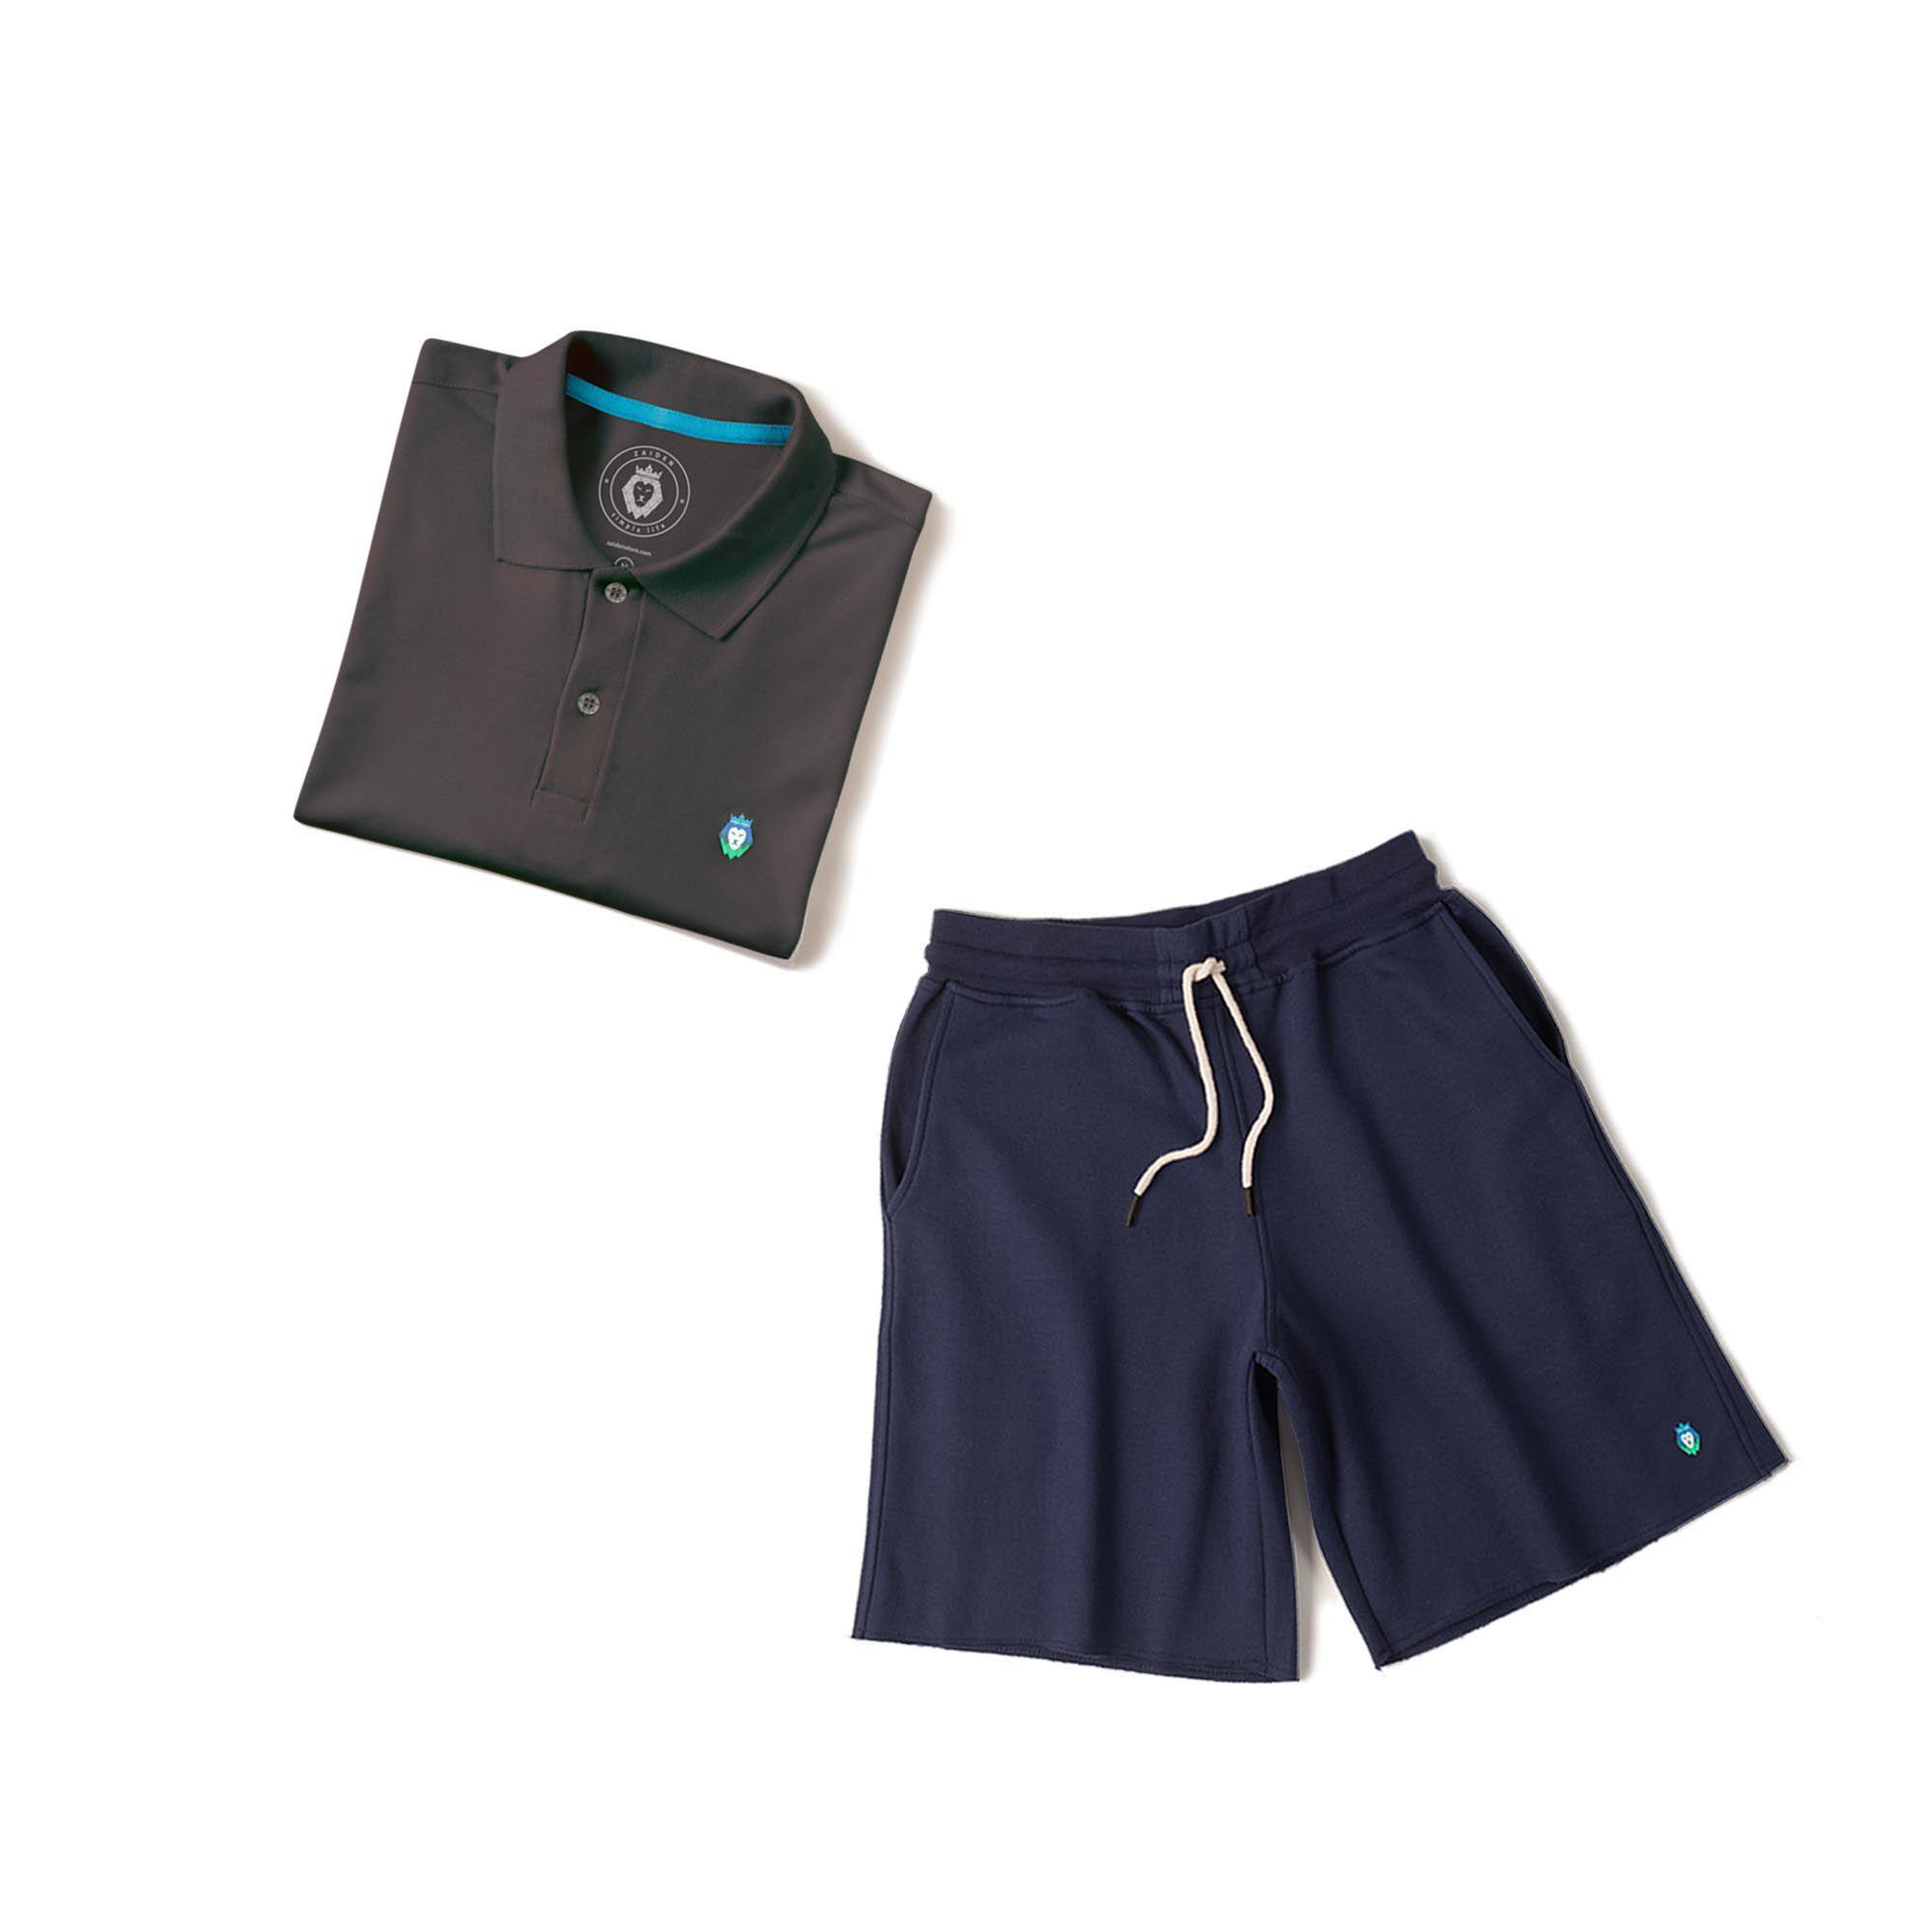 3de998572 ... Kit 1 Bermuda Basic Azul Marinho + 1 Camisa Polo Style Cinza Zaiden  Masculina - ZAIDEN ...